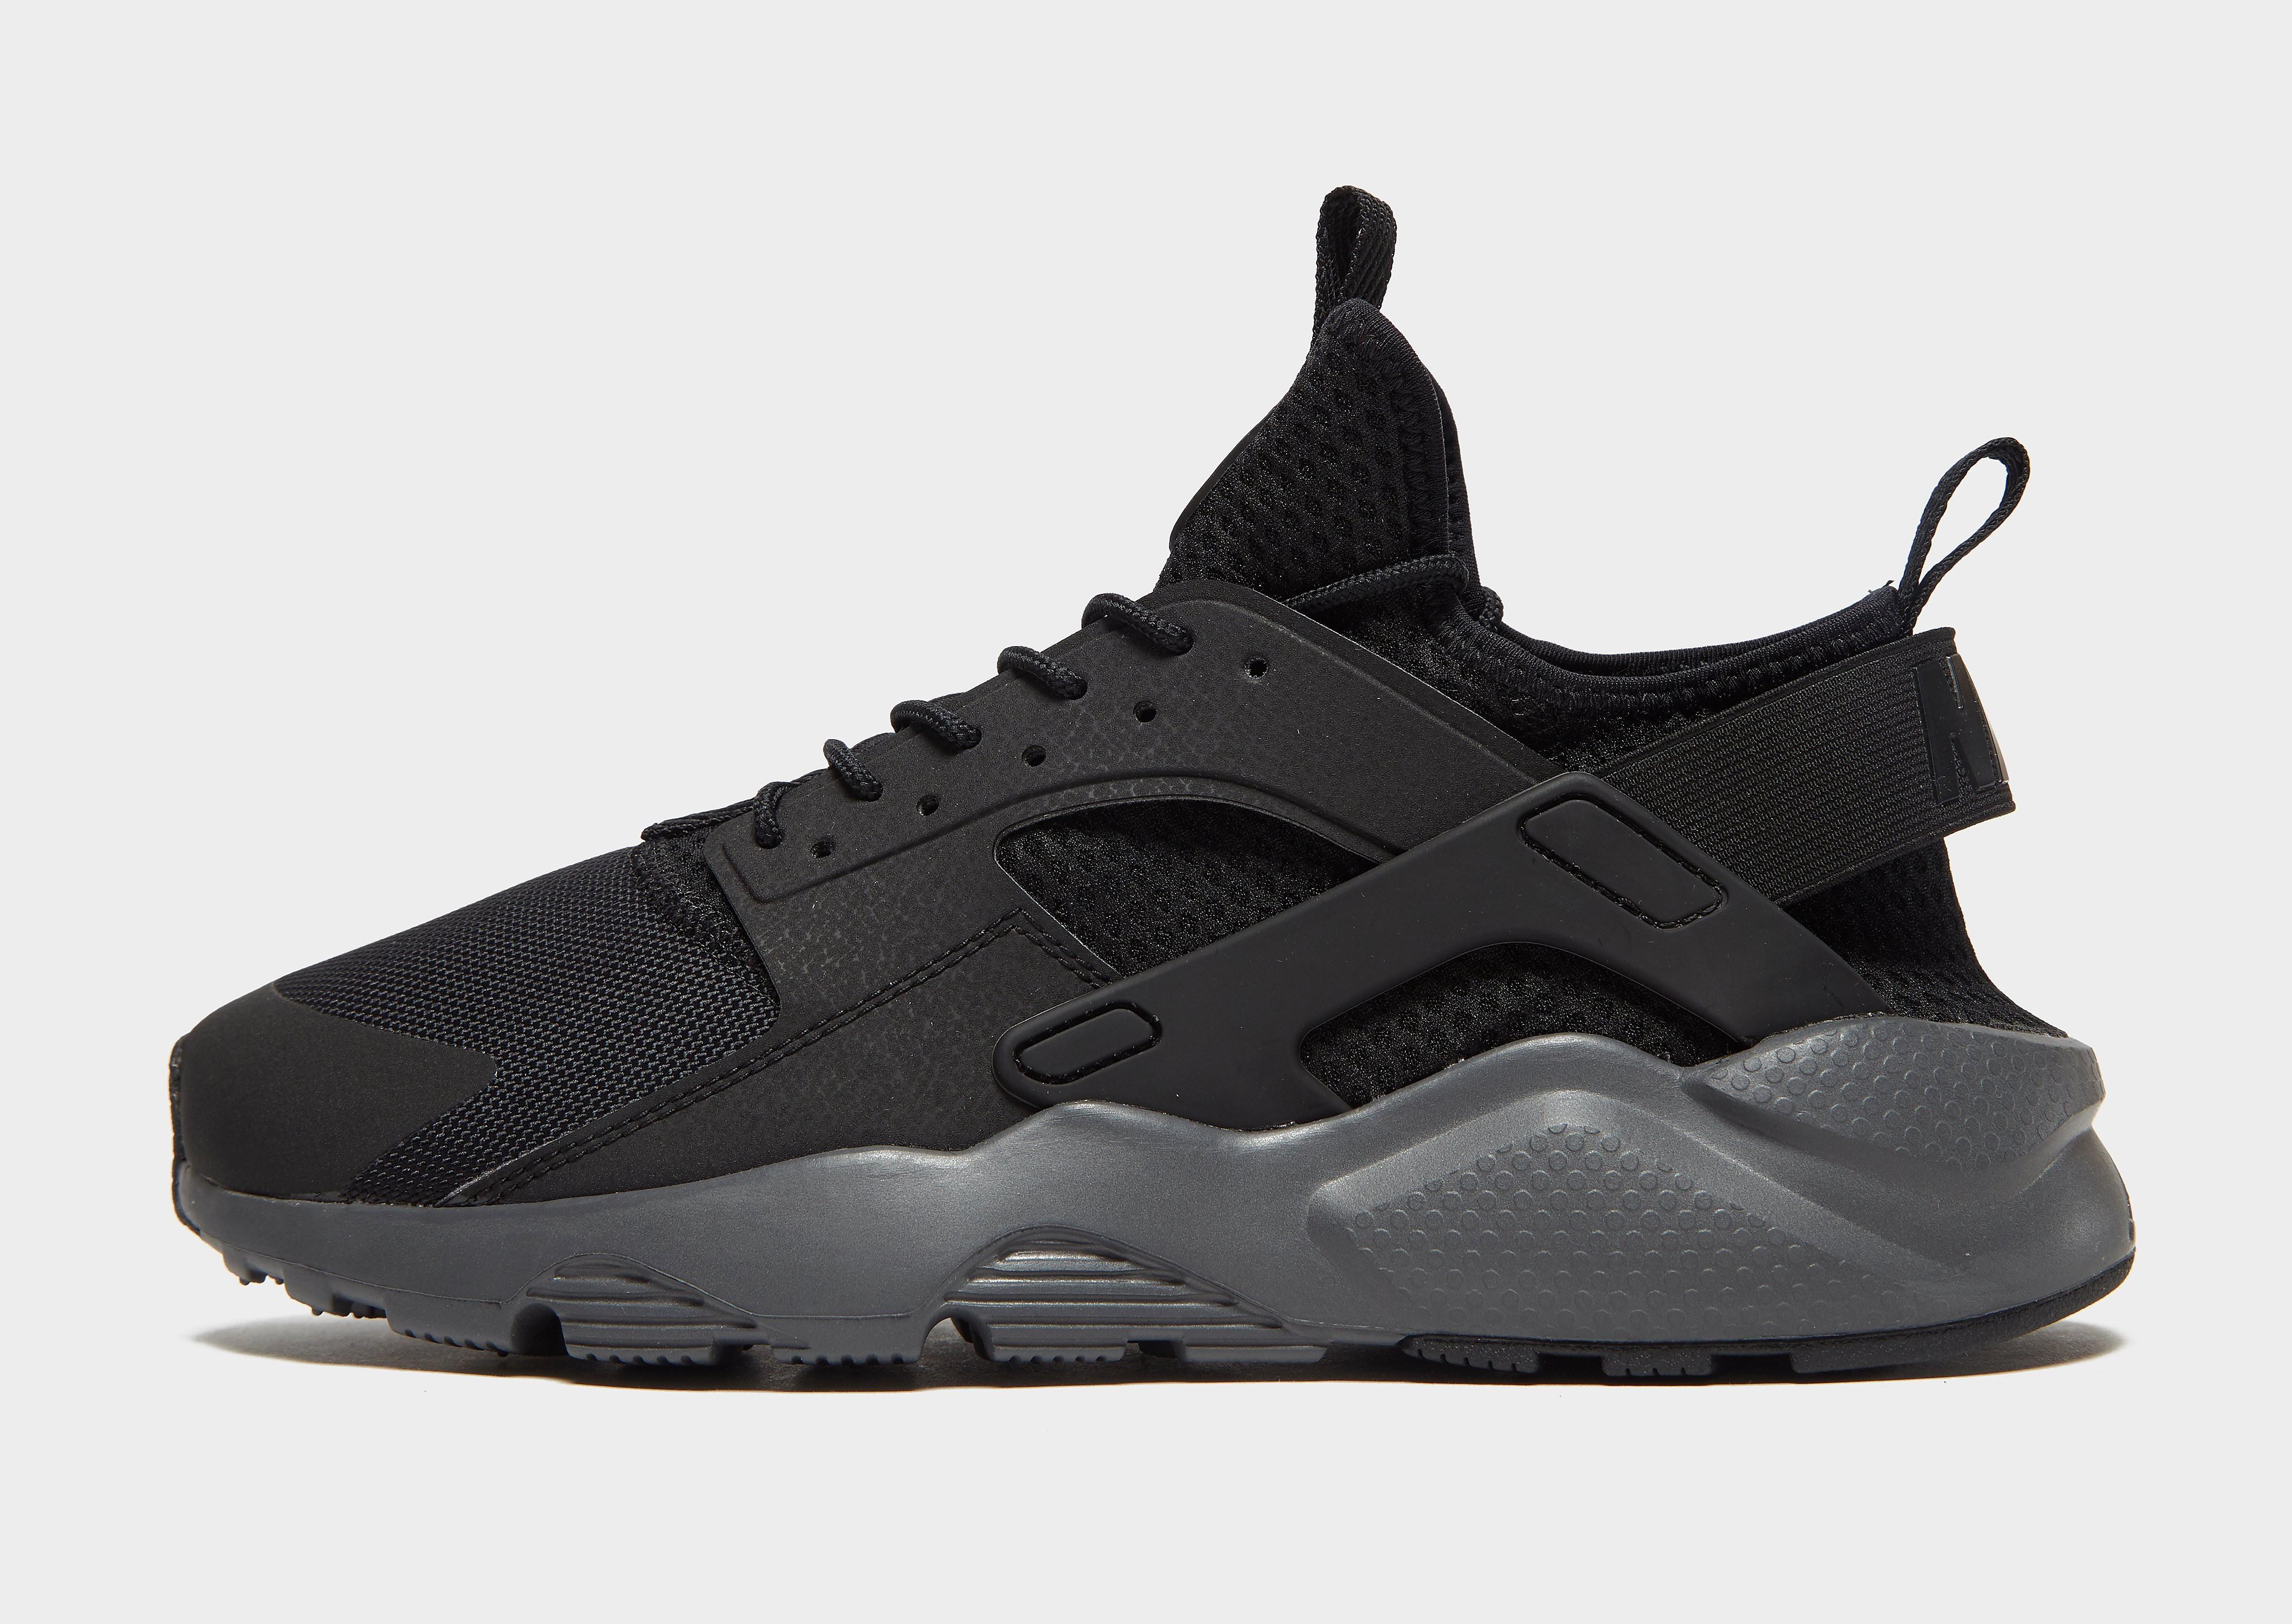 5dcb7401f34 Nike schoenen